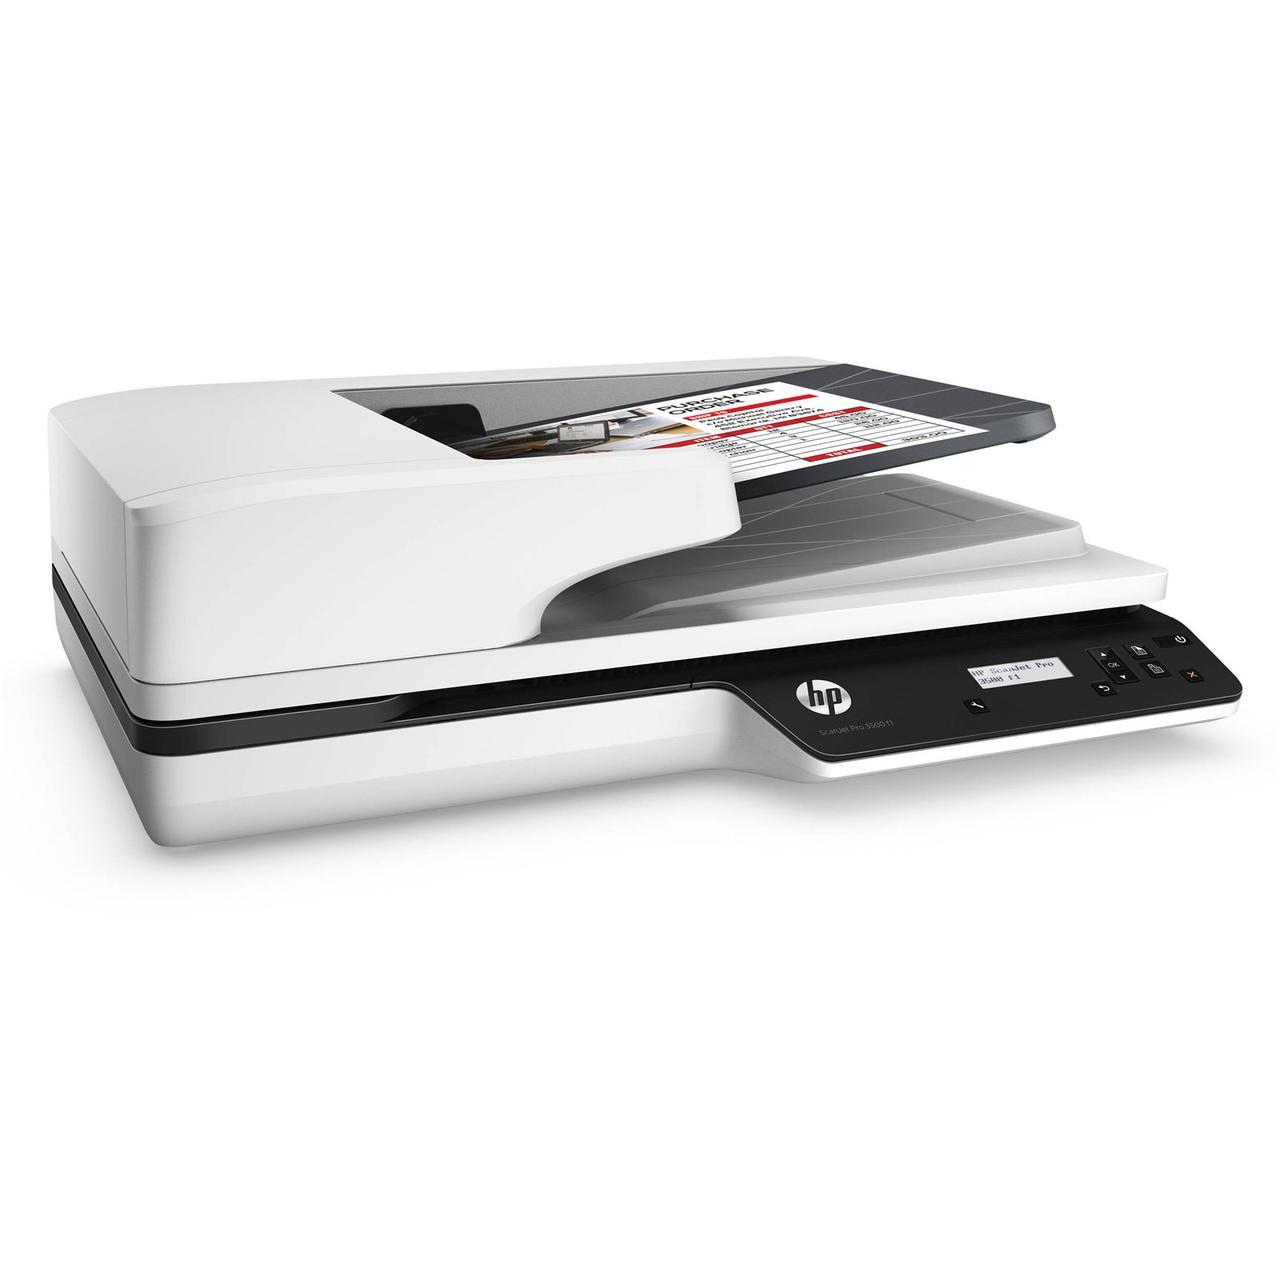 Планшетный сканер HP ScanJet Pro 3500 f1